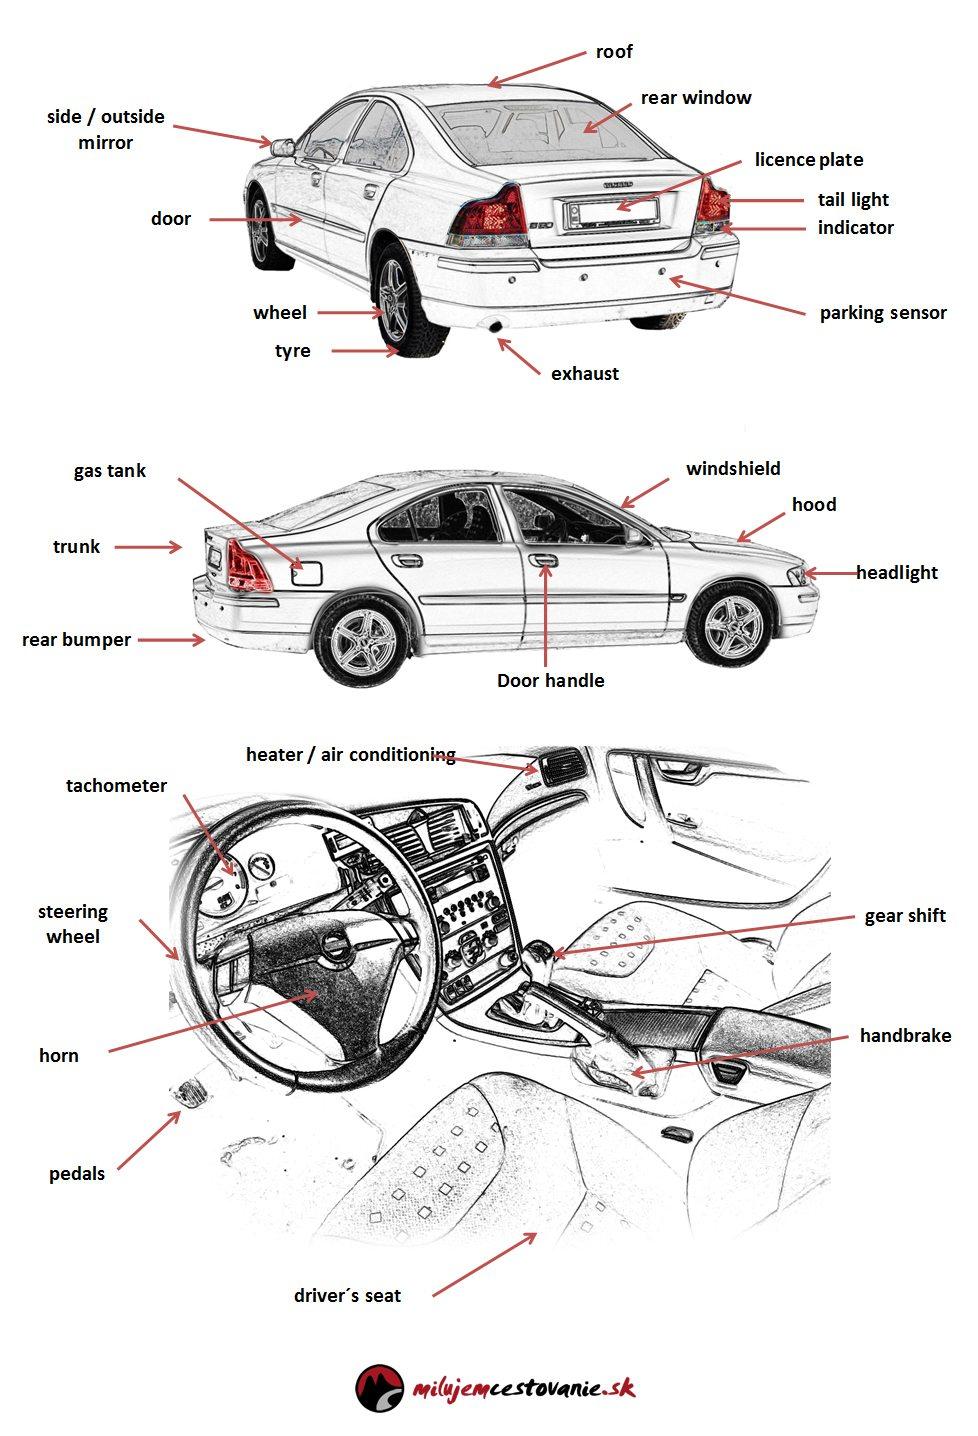 Car parts in spanish quizlet 14